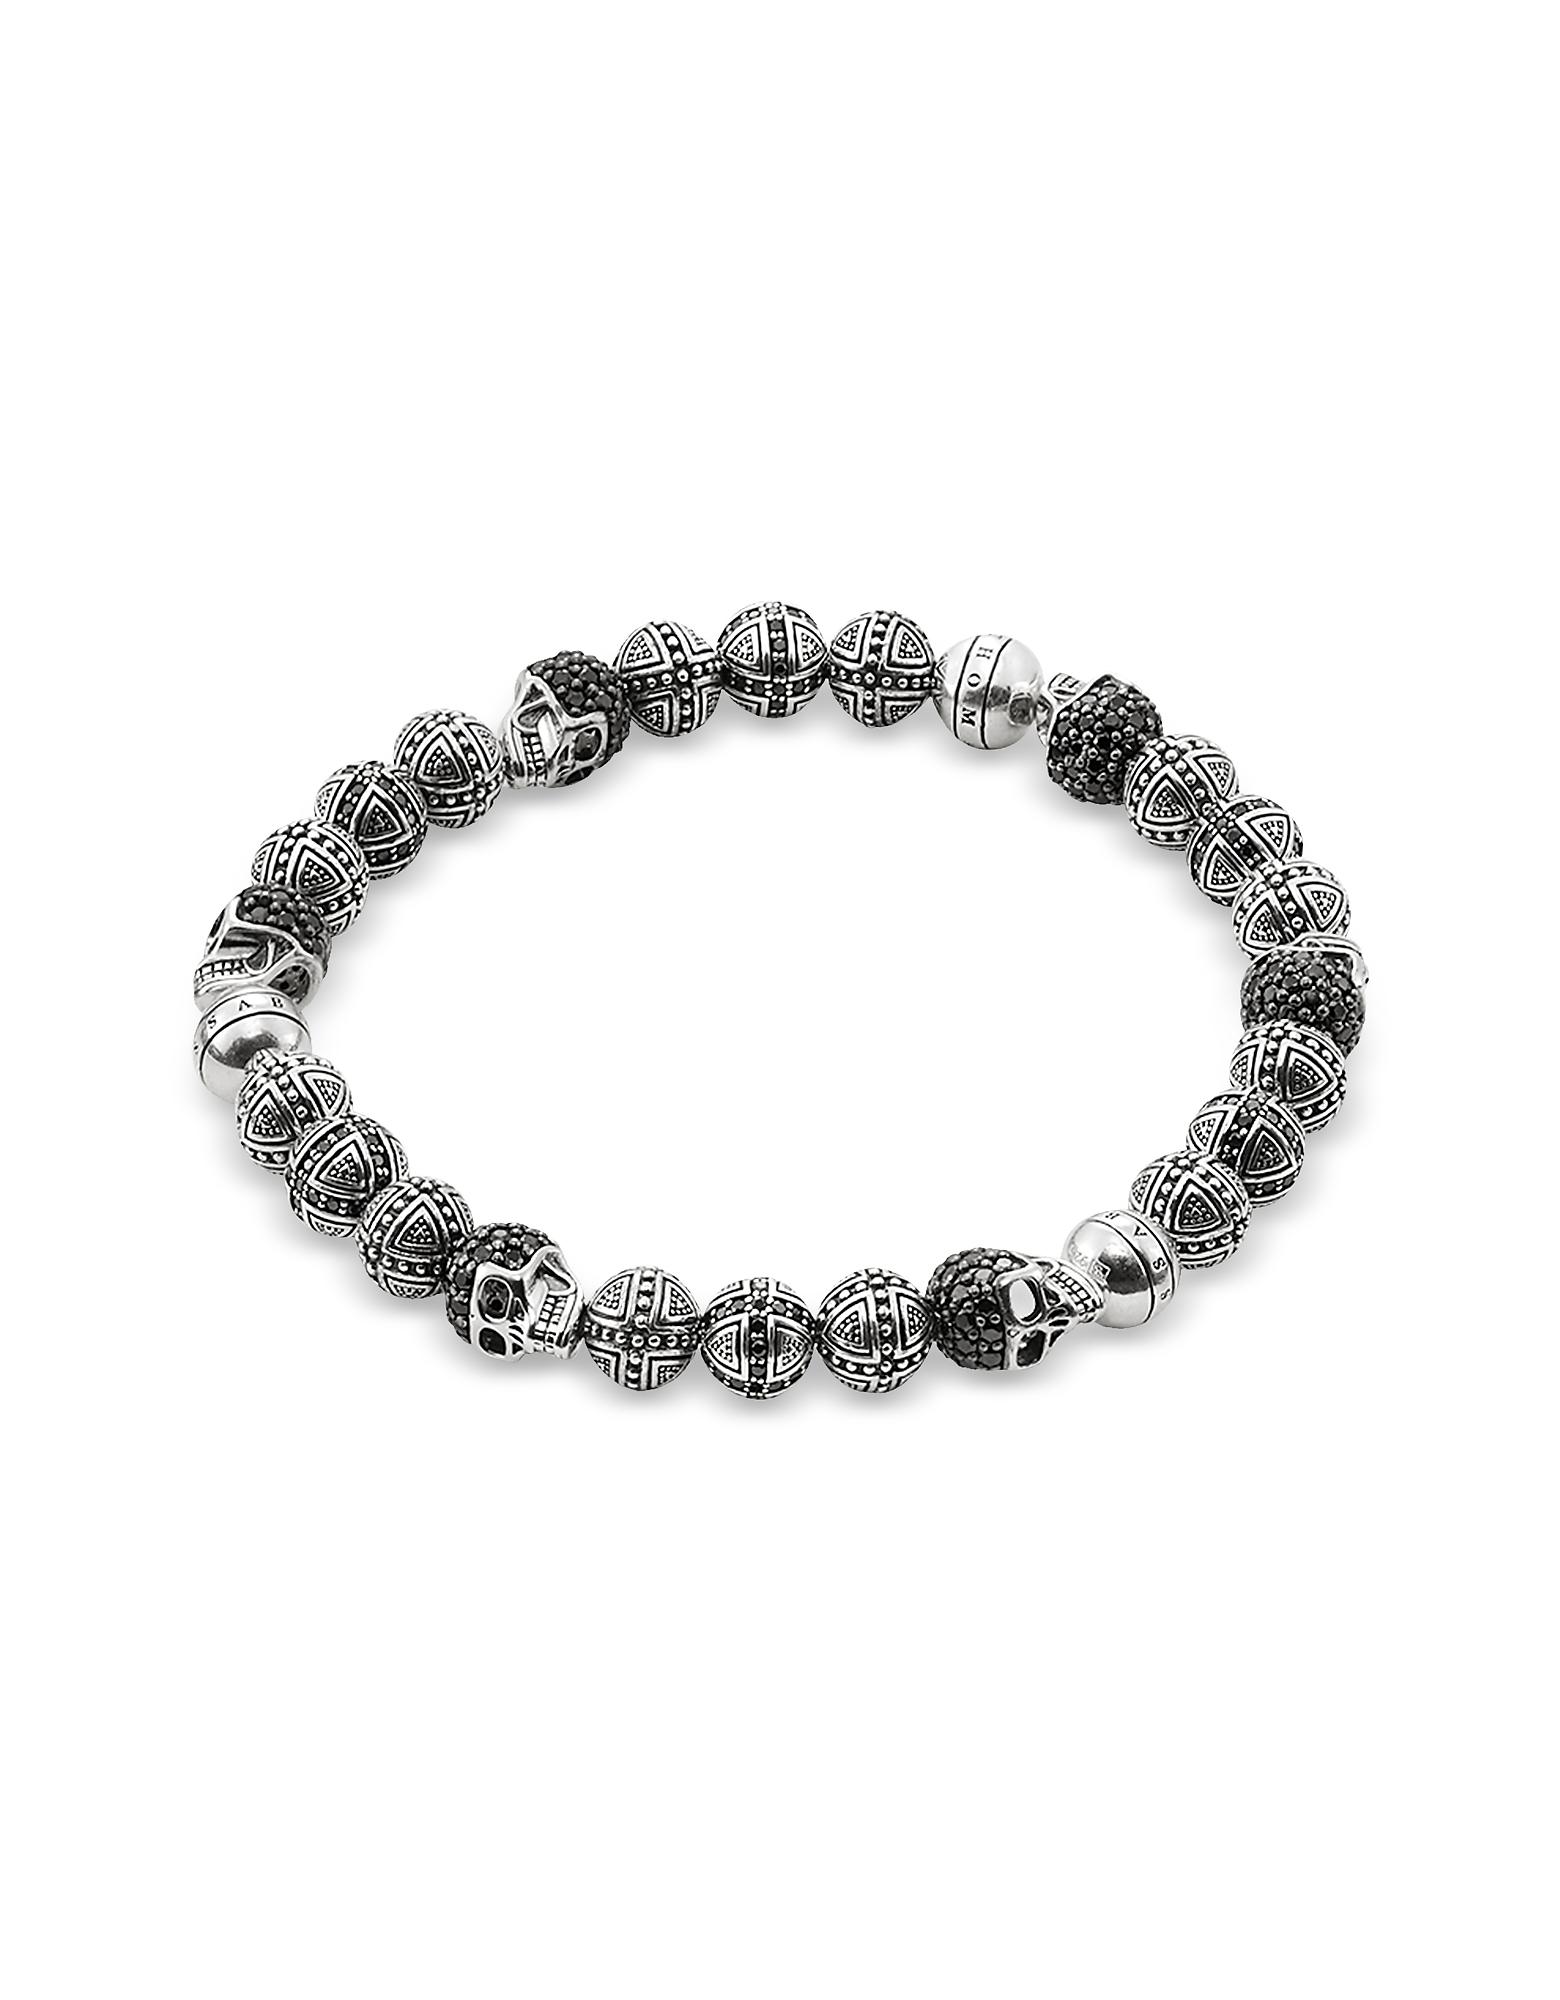 Blackened 925 Sterling Silver Cross and Skulls Bracelet w/Zirconia. Cross and Skulls Bracelet w/Zirconia crafted in blackened 925 sterling silver, is